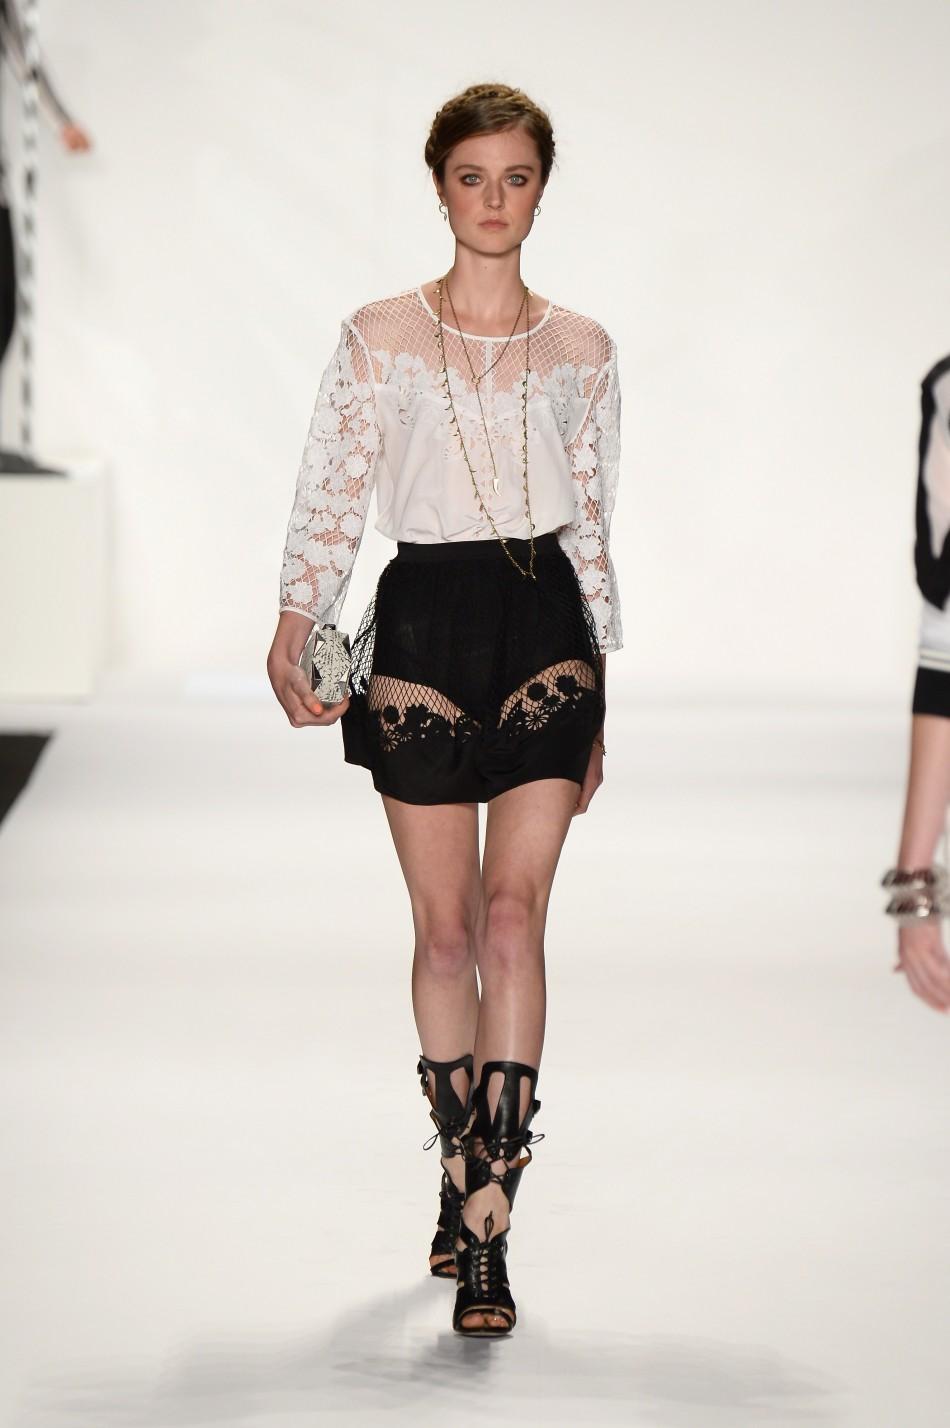 20587-rebecca-minkoff-spring-2014-new-york-fashion-week.jpg